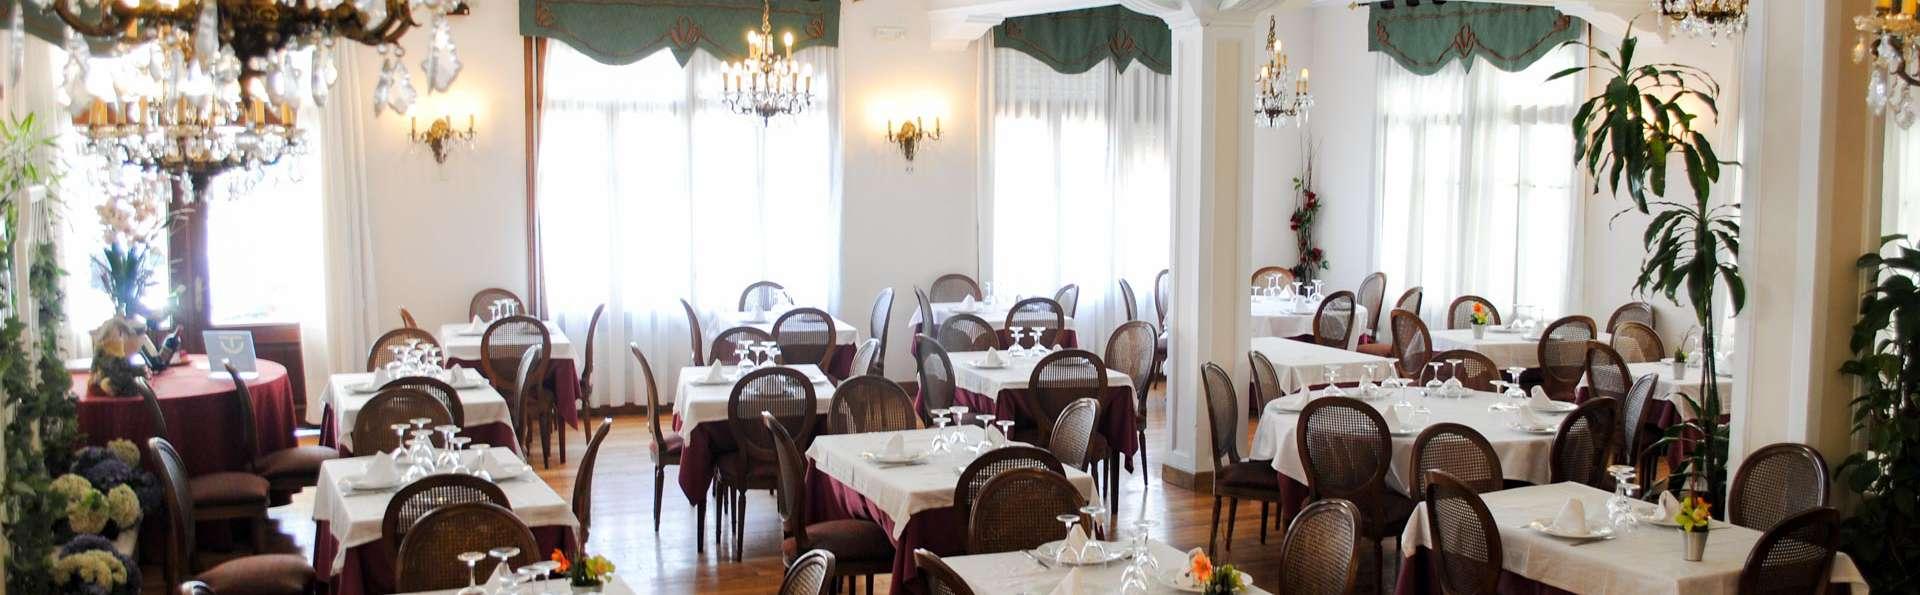 Hotel Zarauz  - EDIT_RESTAURANT_02.jpg